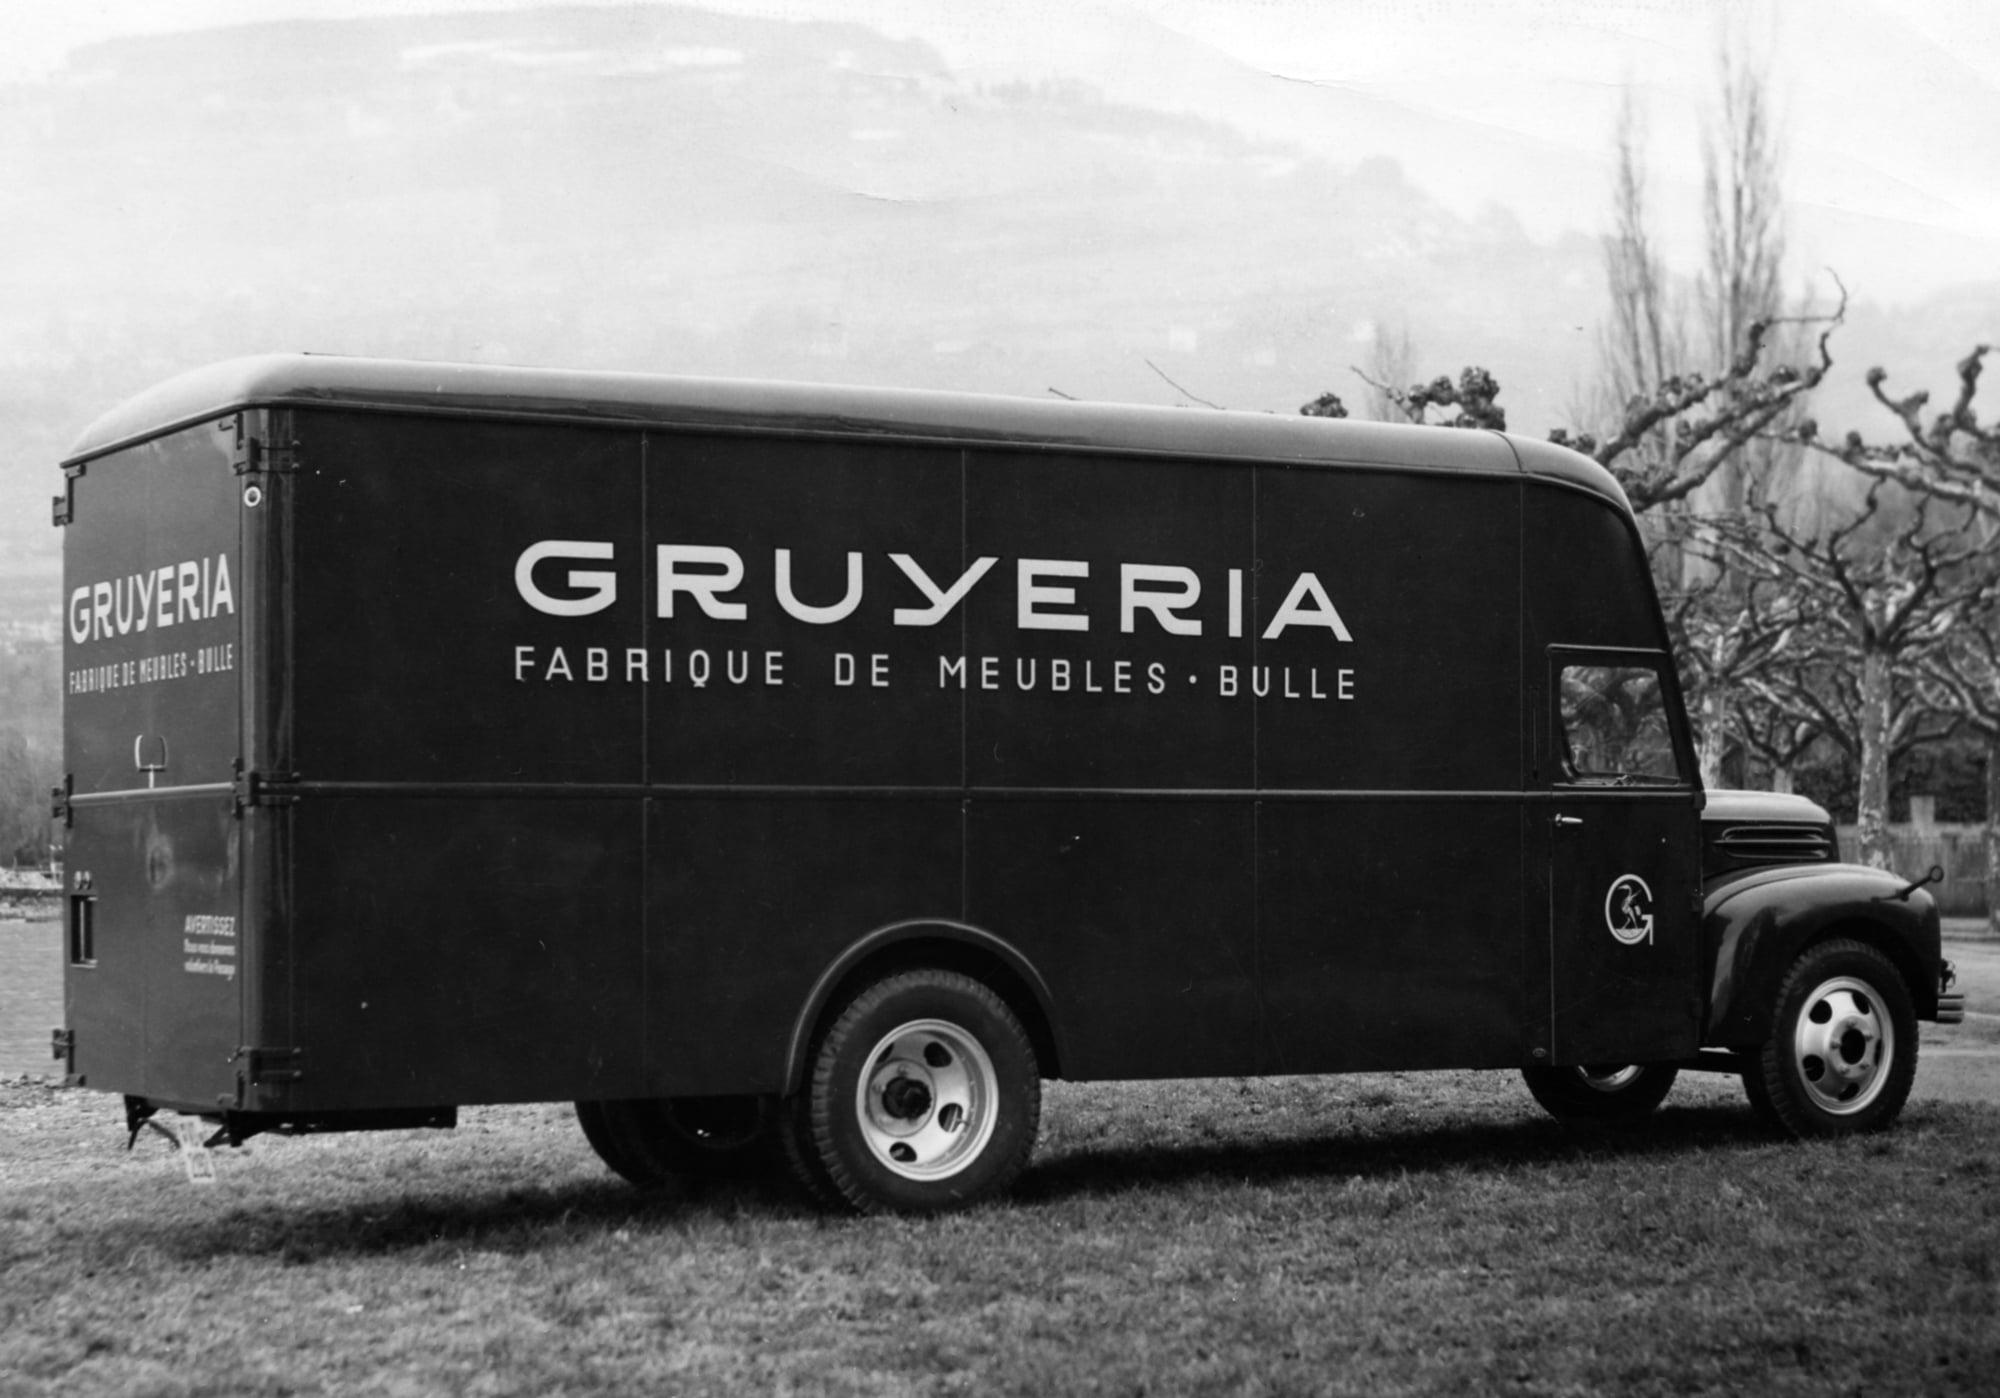 ancien camion Gruyeria Bulle